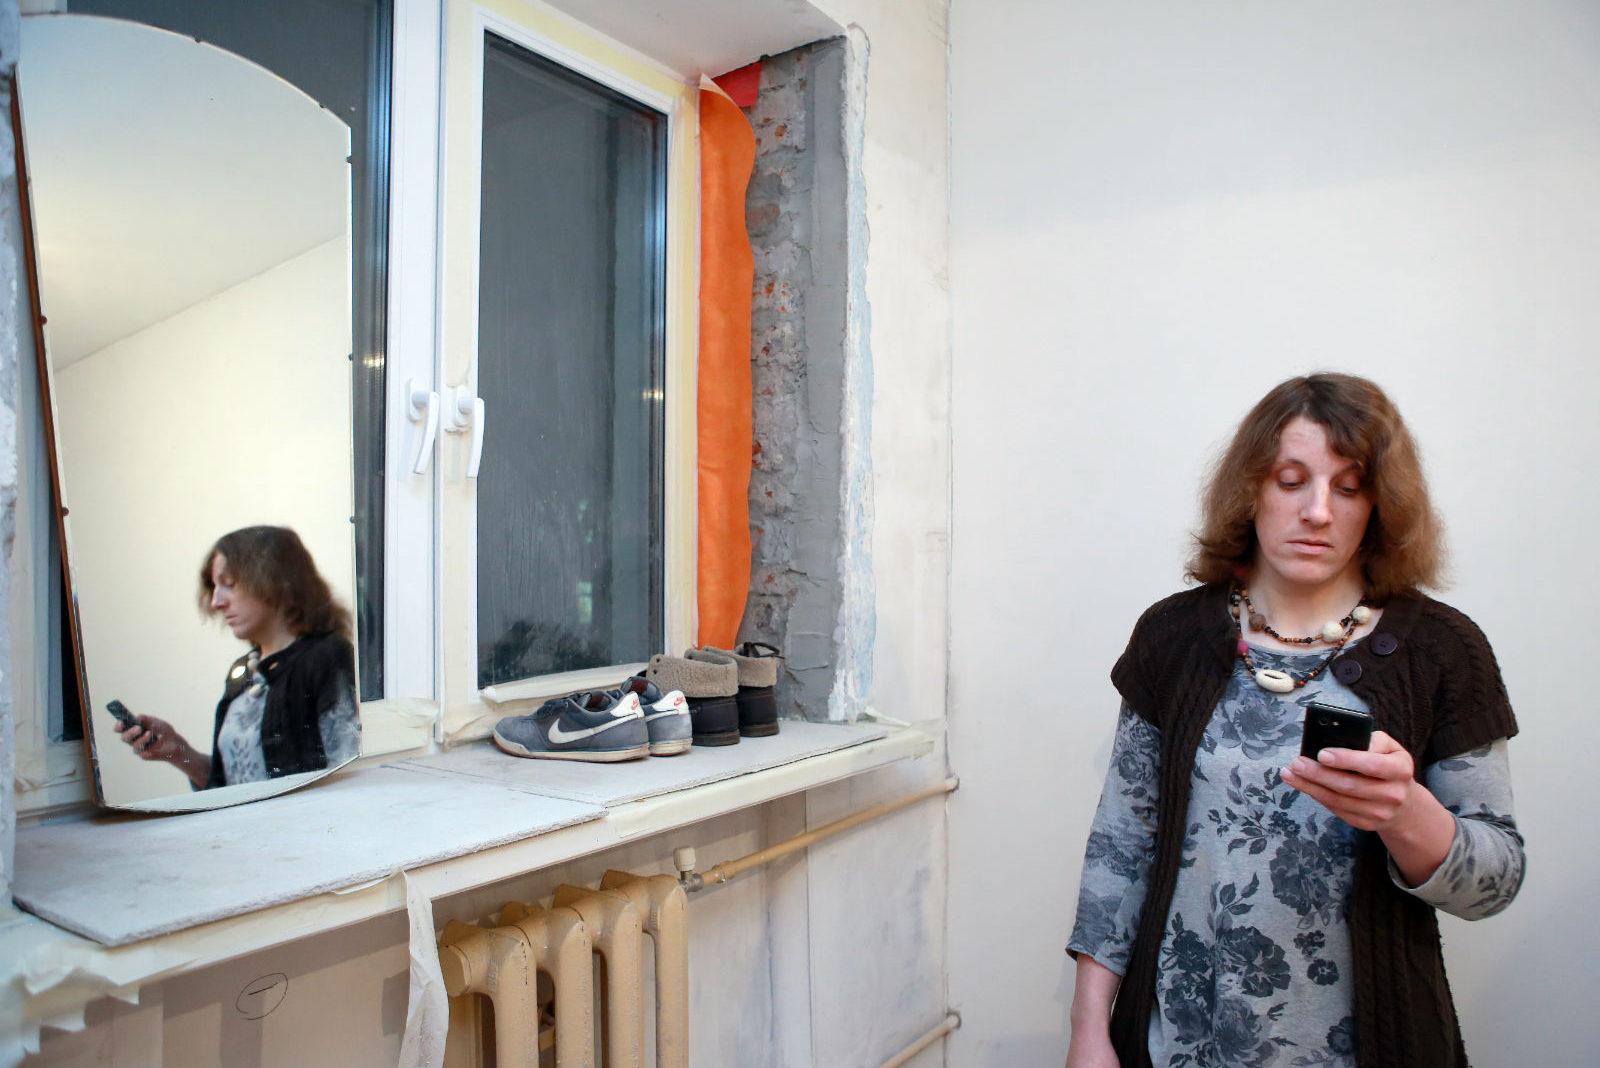 Alina in her apartment